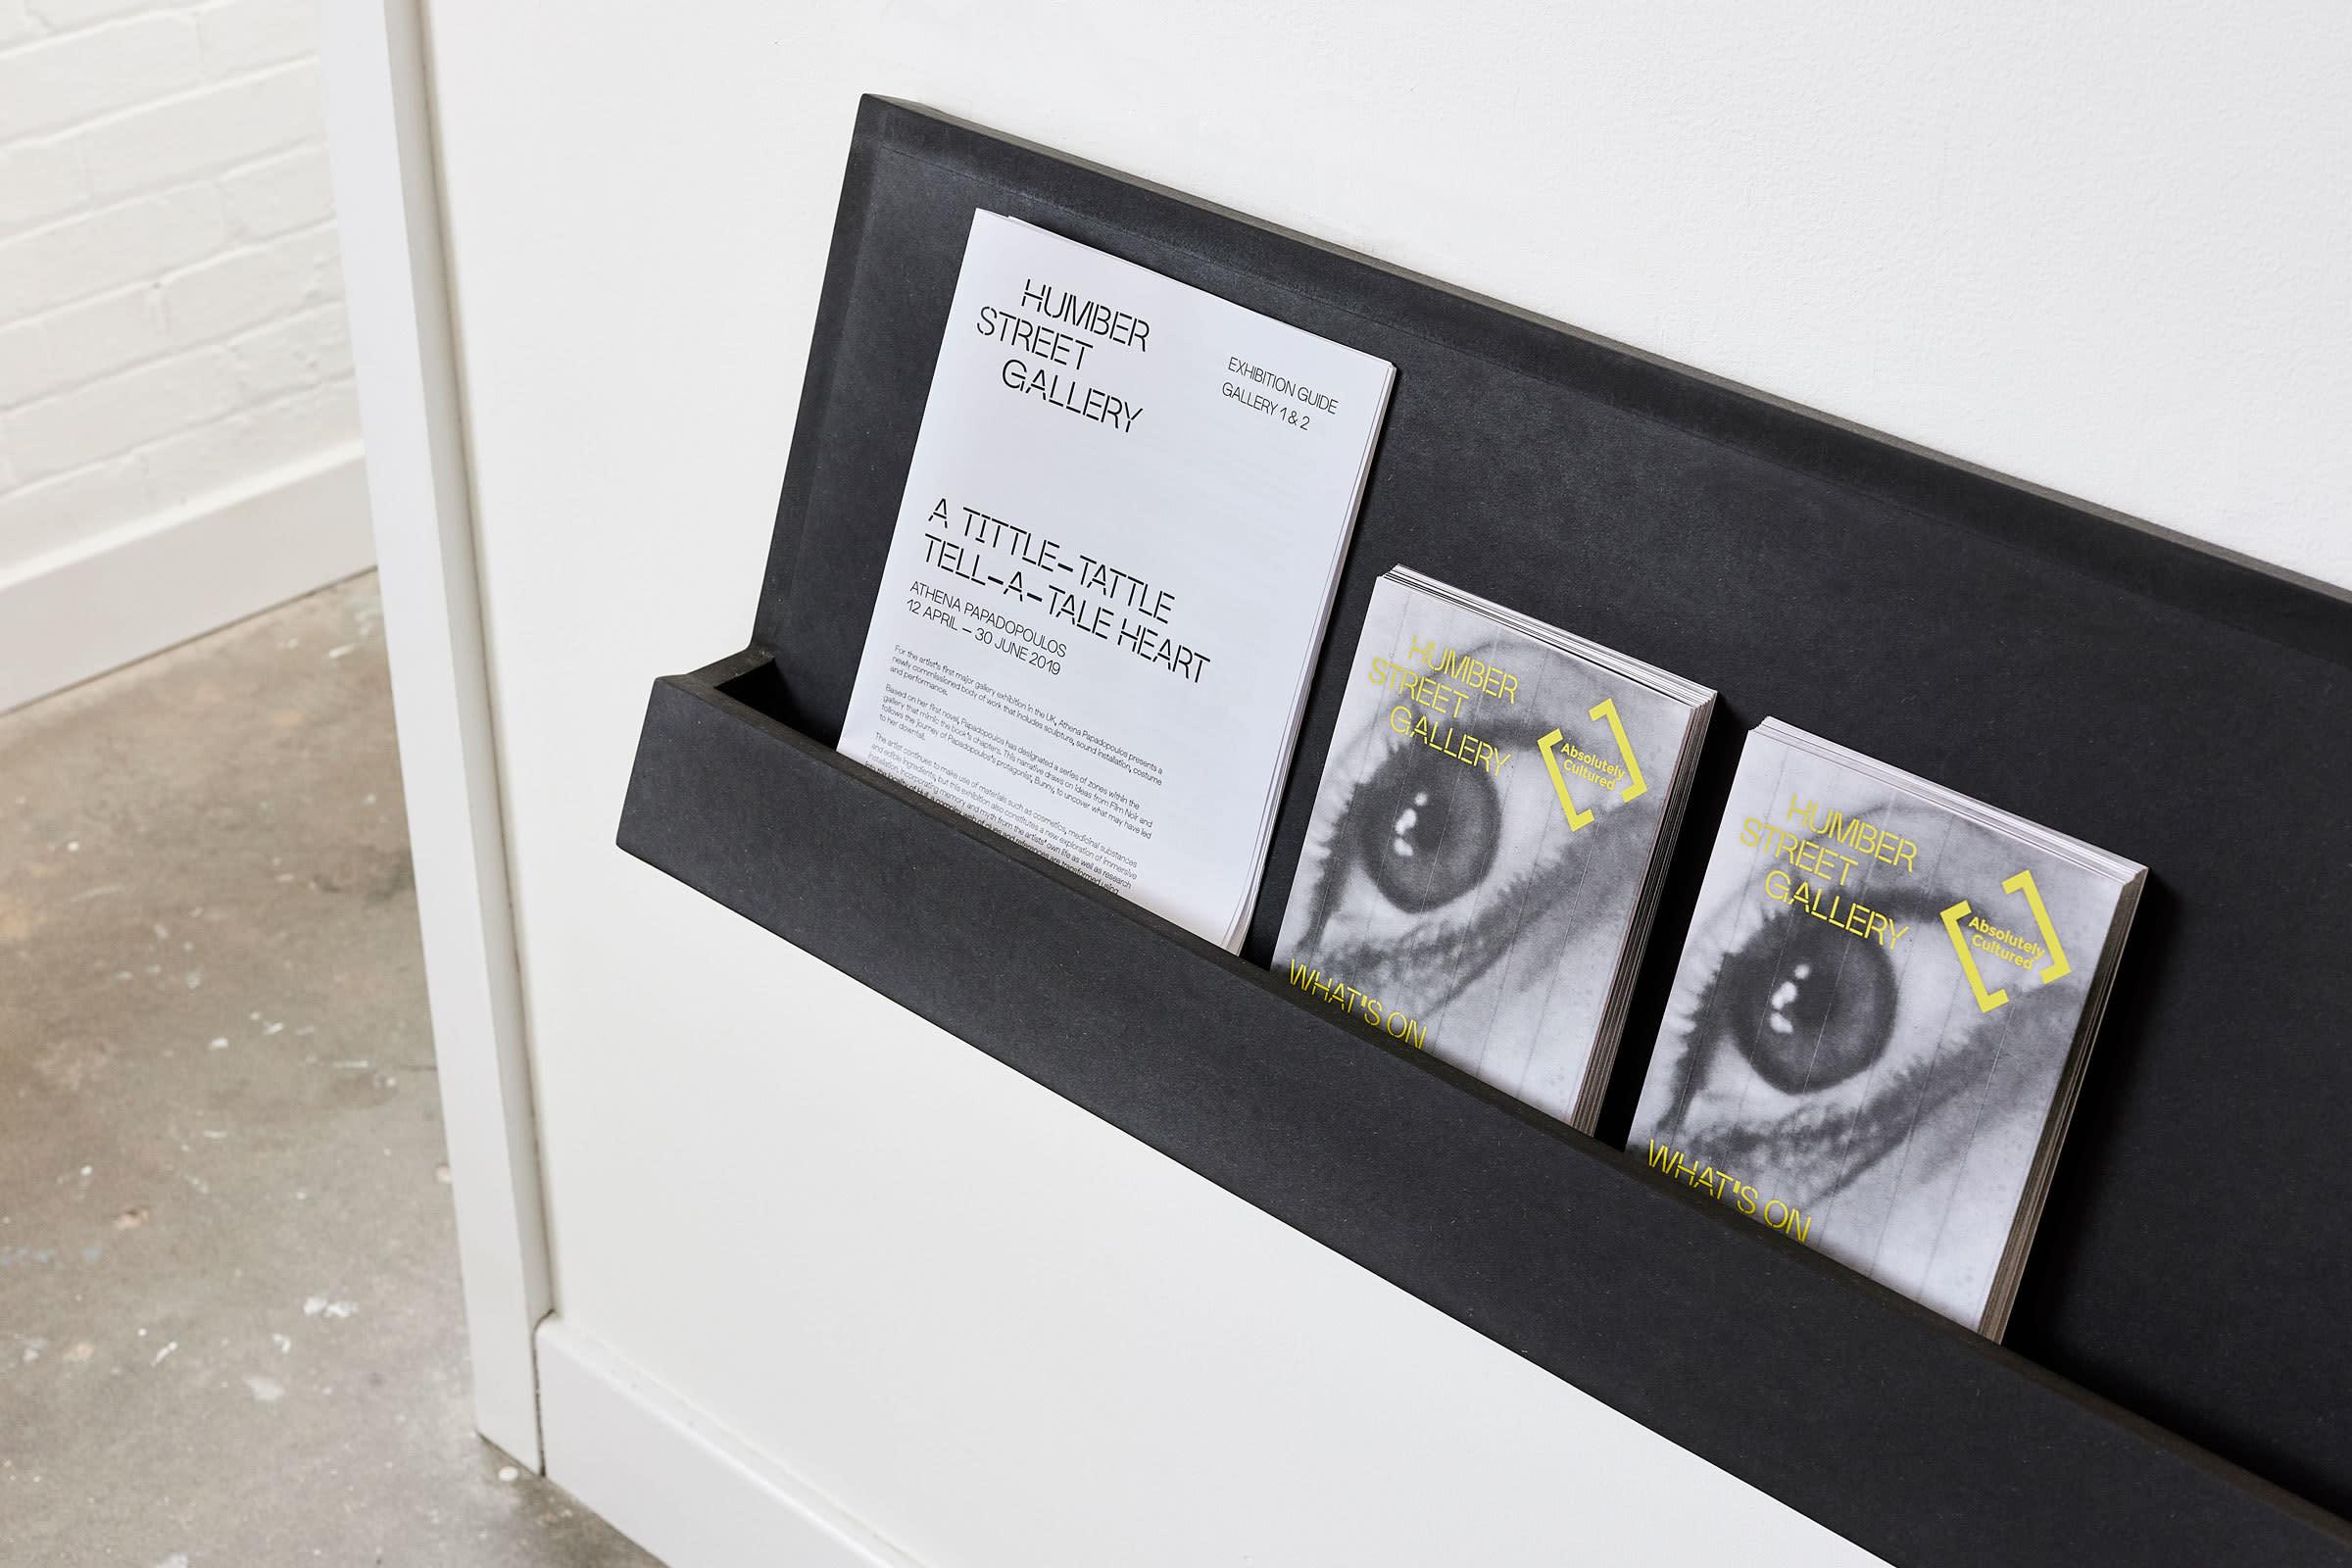 saul studio — Humber Street Gallery